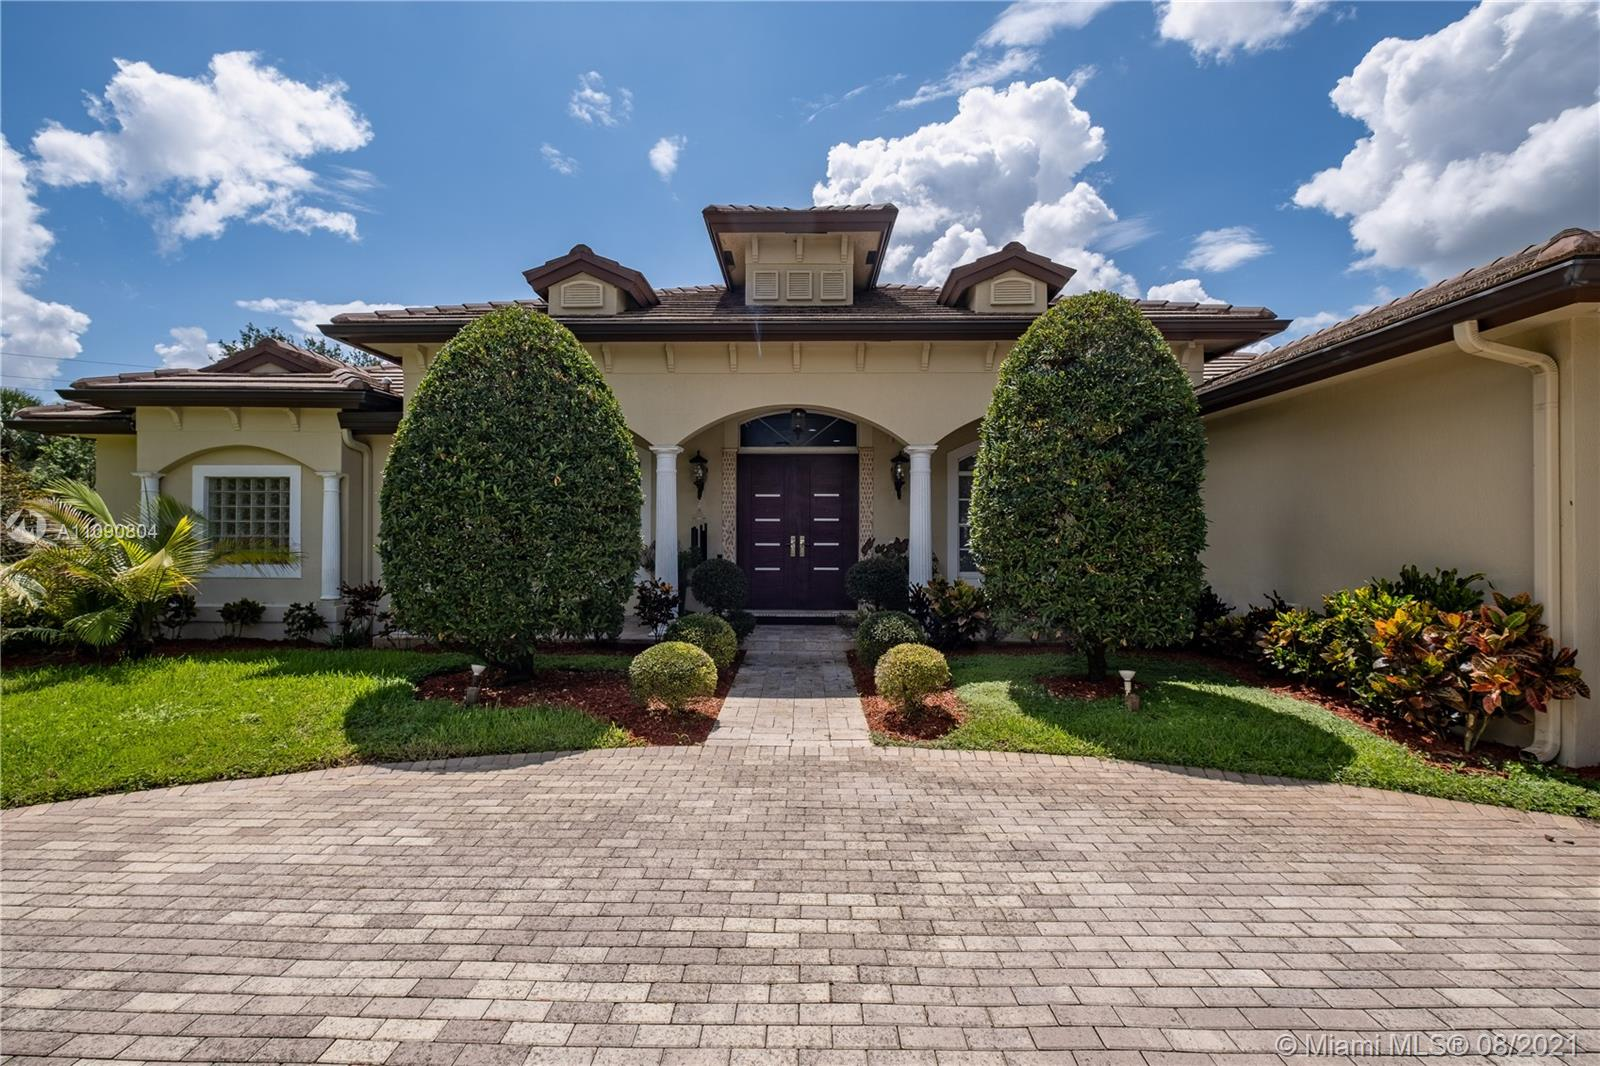 Charleston Oaks - 2850 E Jockey Cir E, Davie, FL 33330